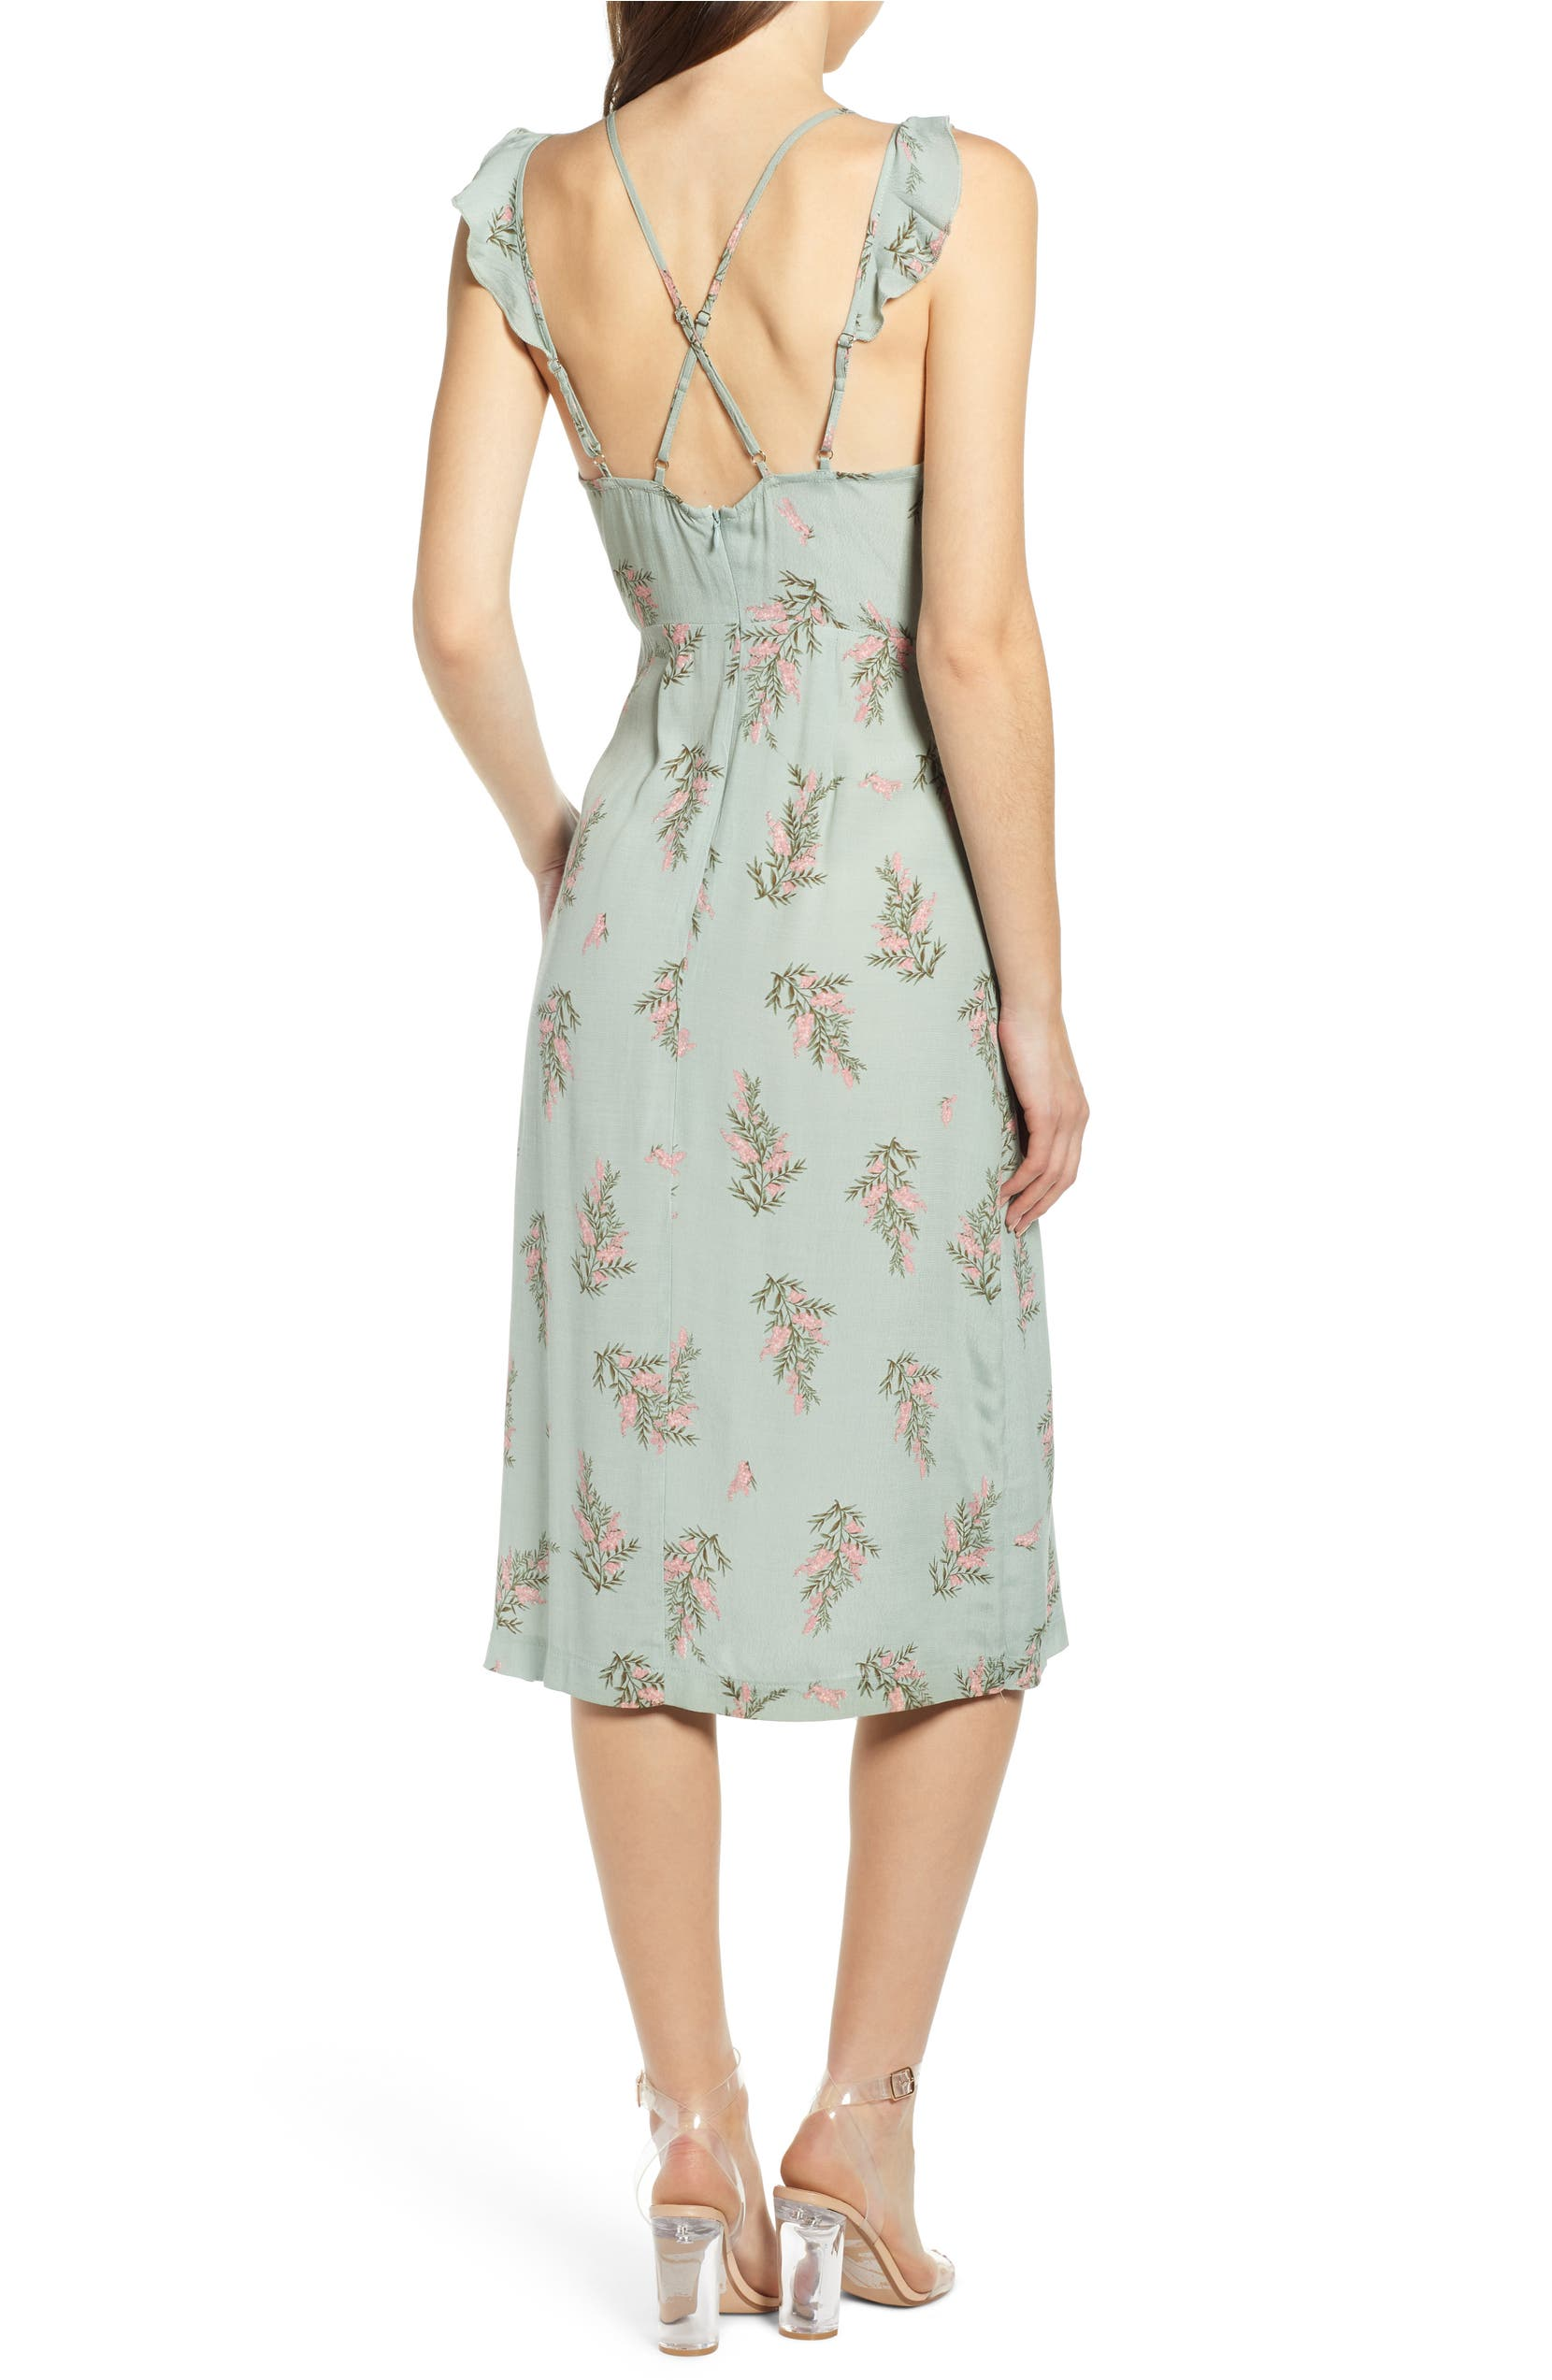 d09b2dc89f97c Dual Strap Floral Wrap Midi Dress